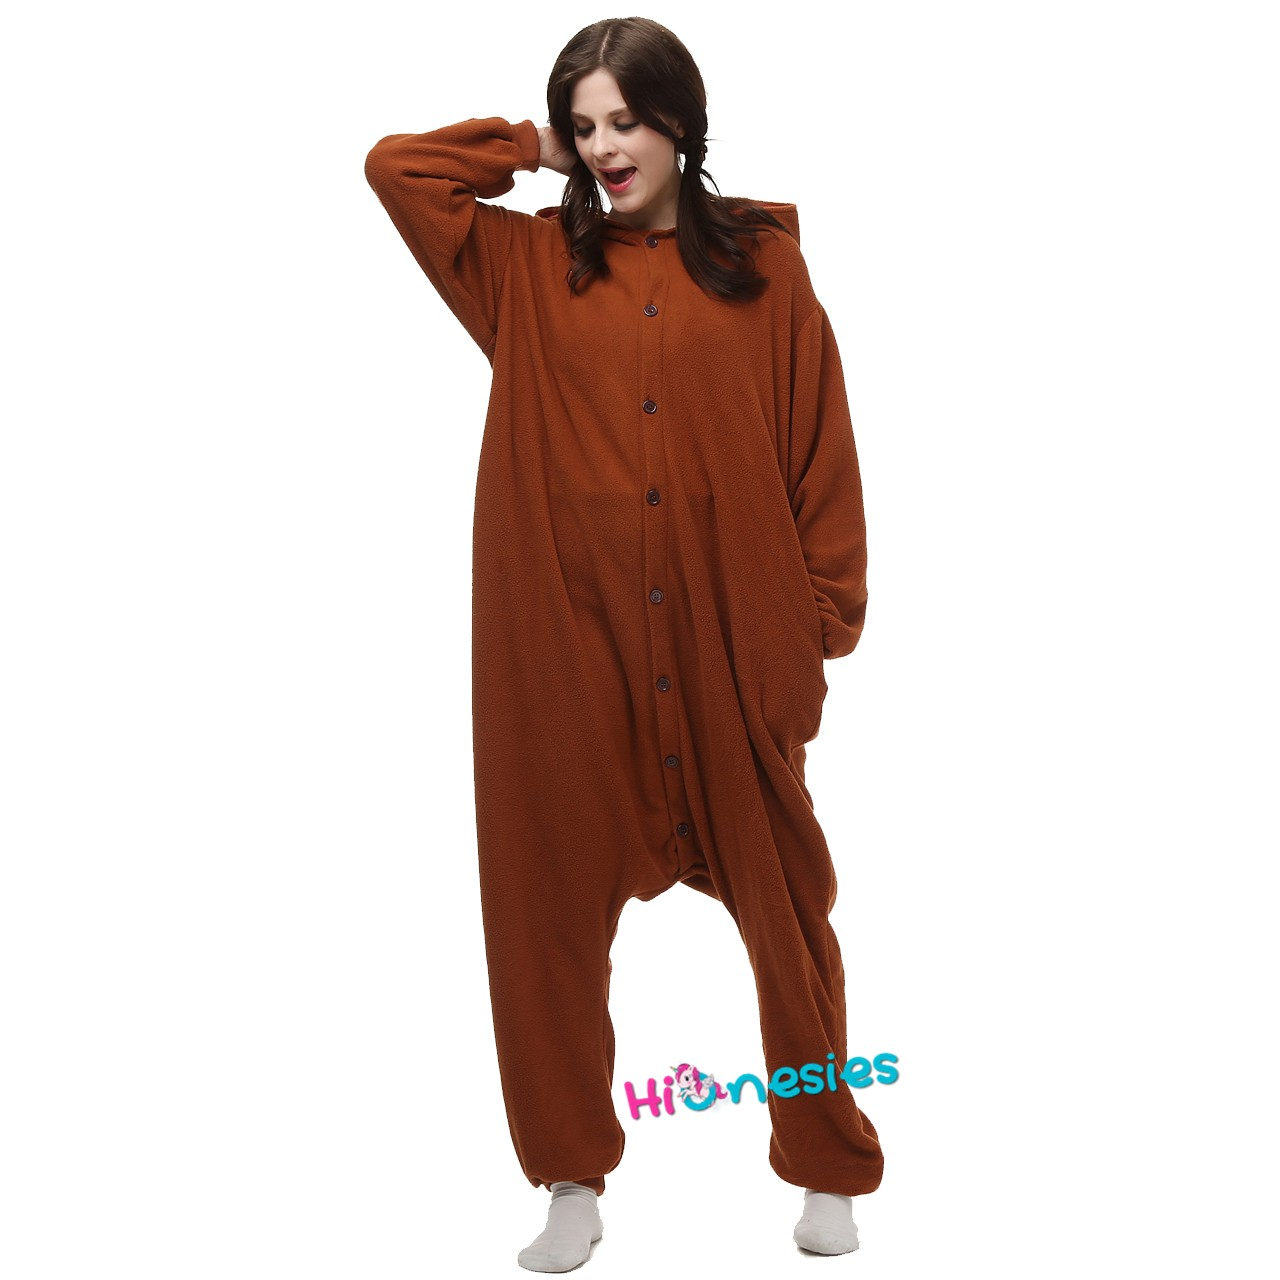 Loading ... Brown Bear Onesie Animal Kigurumi Pajama for Adult Halloween ... cebca48dc0cc